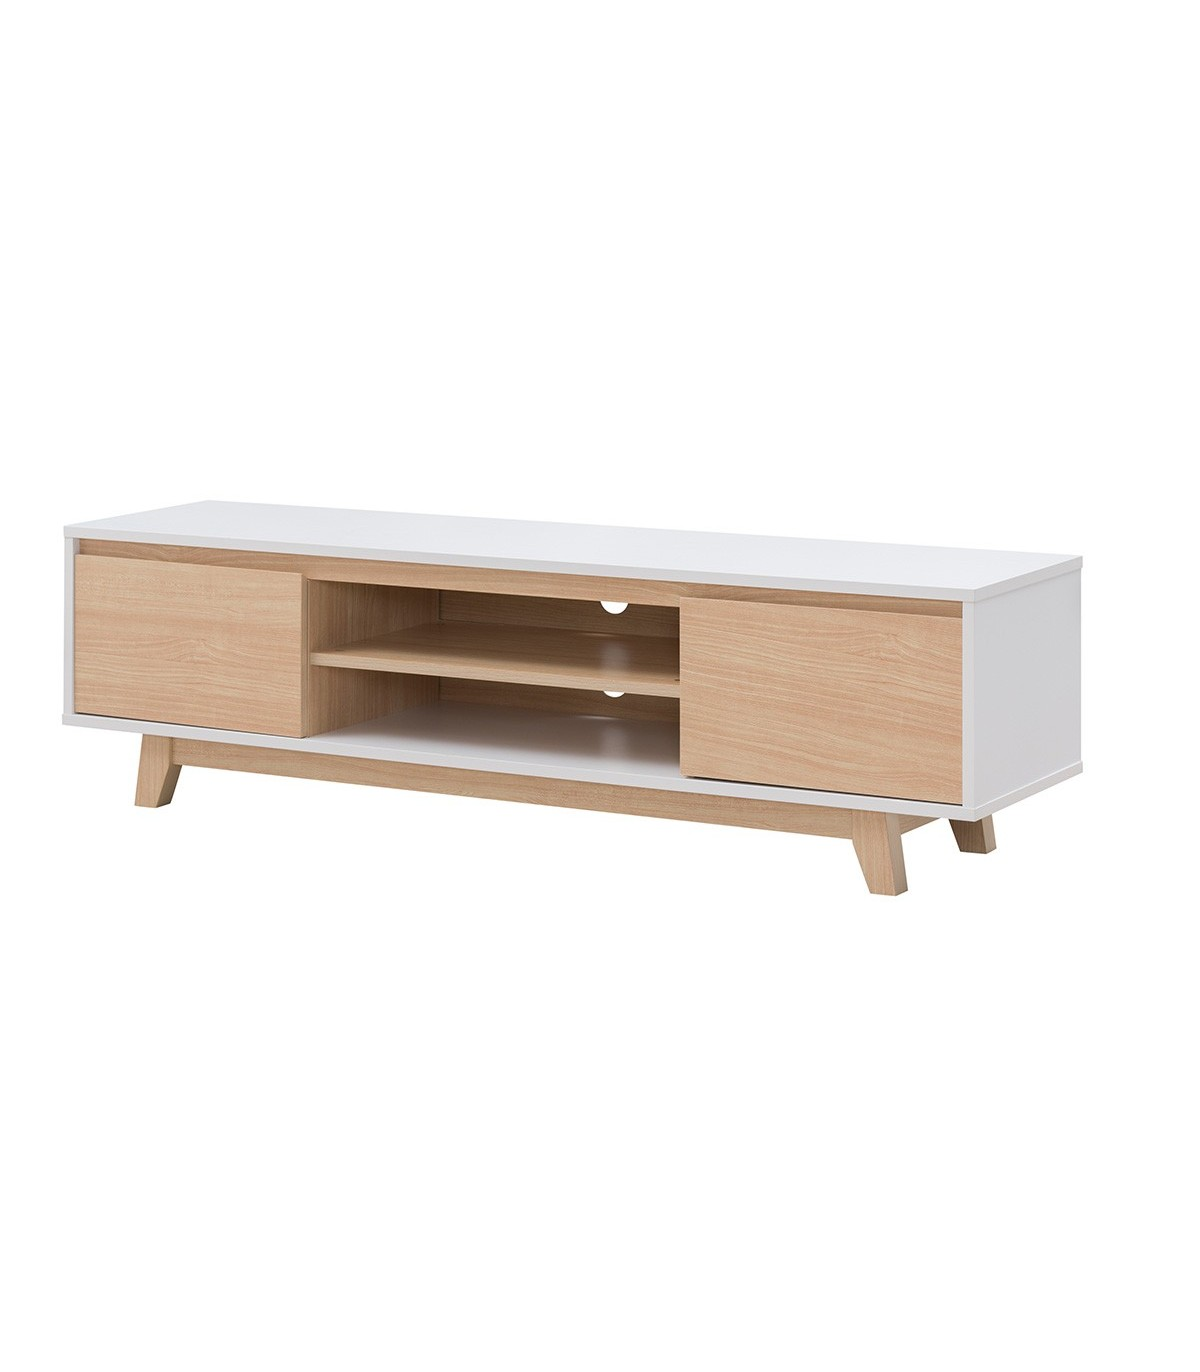 meuble tv scandinave blanc et bois erable fjord